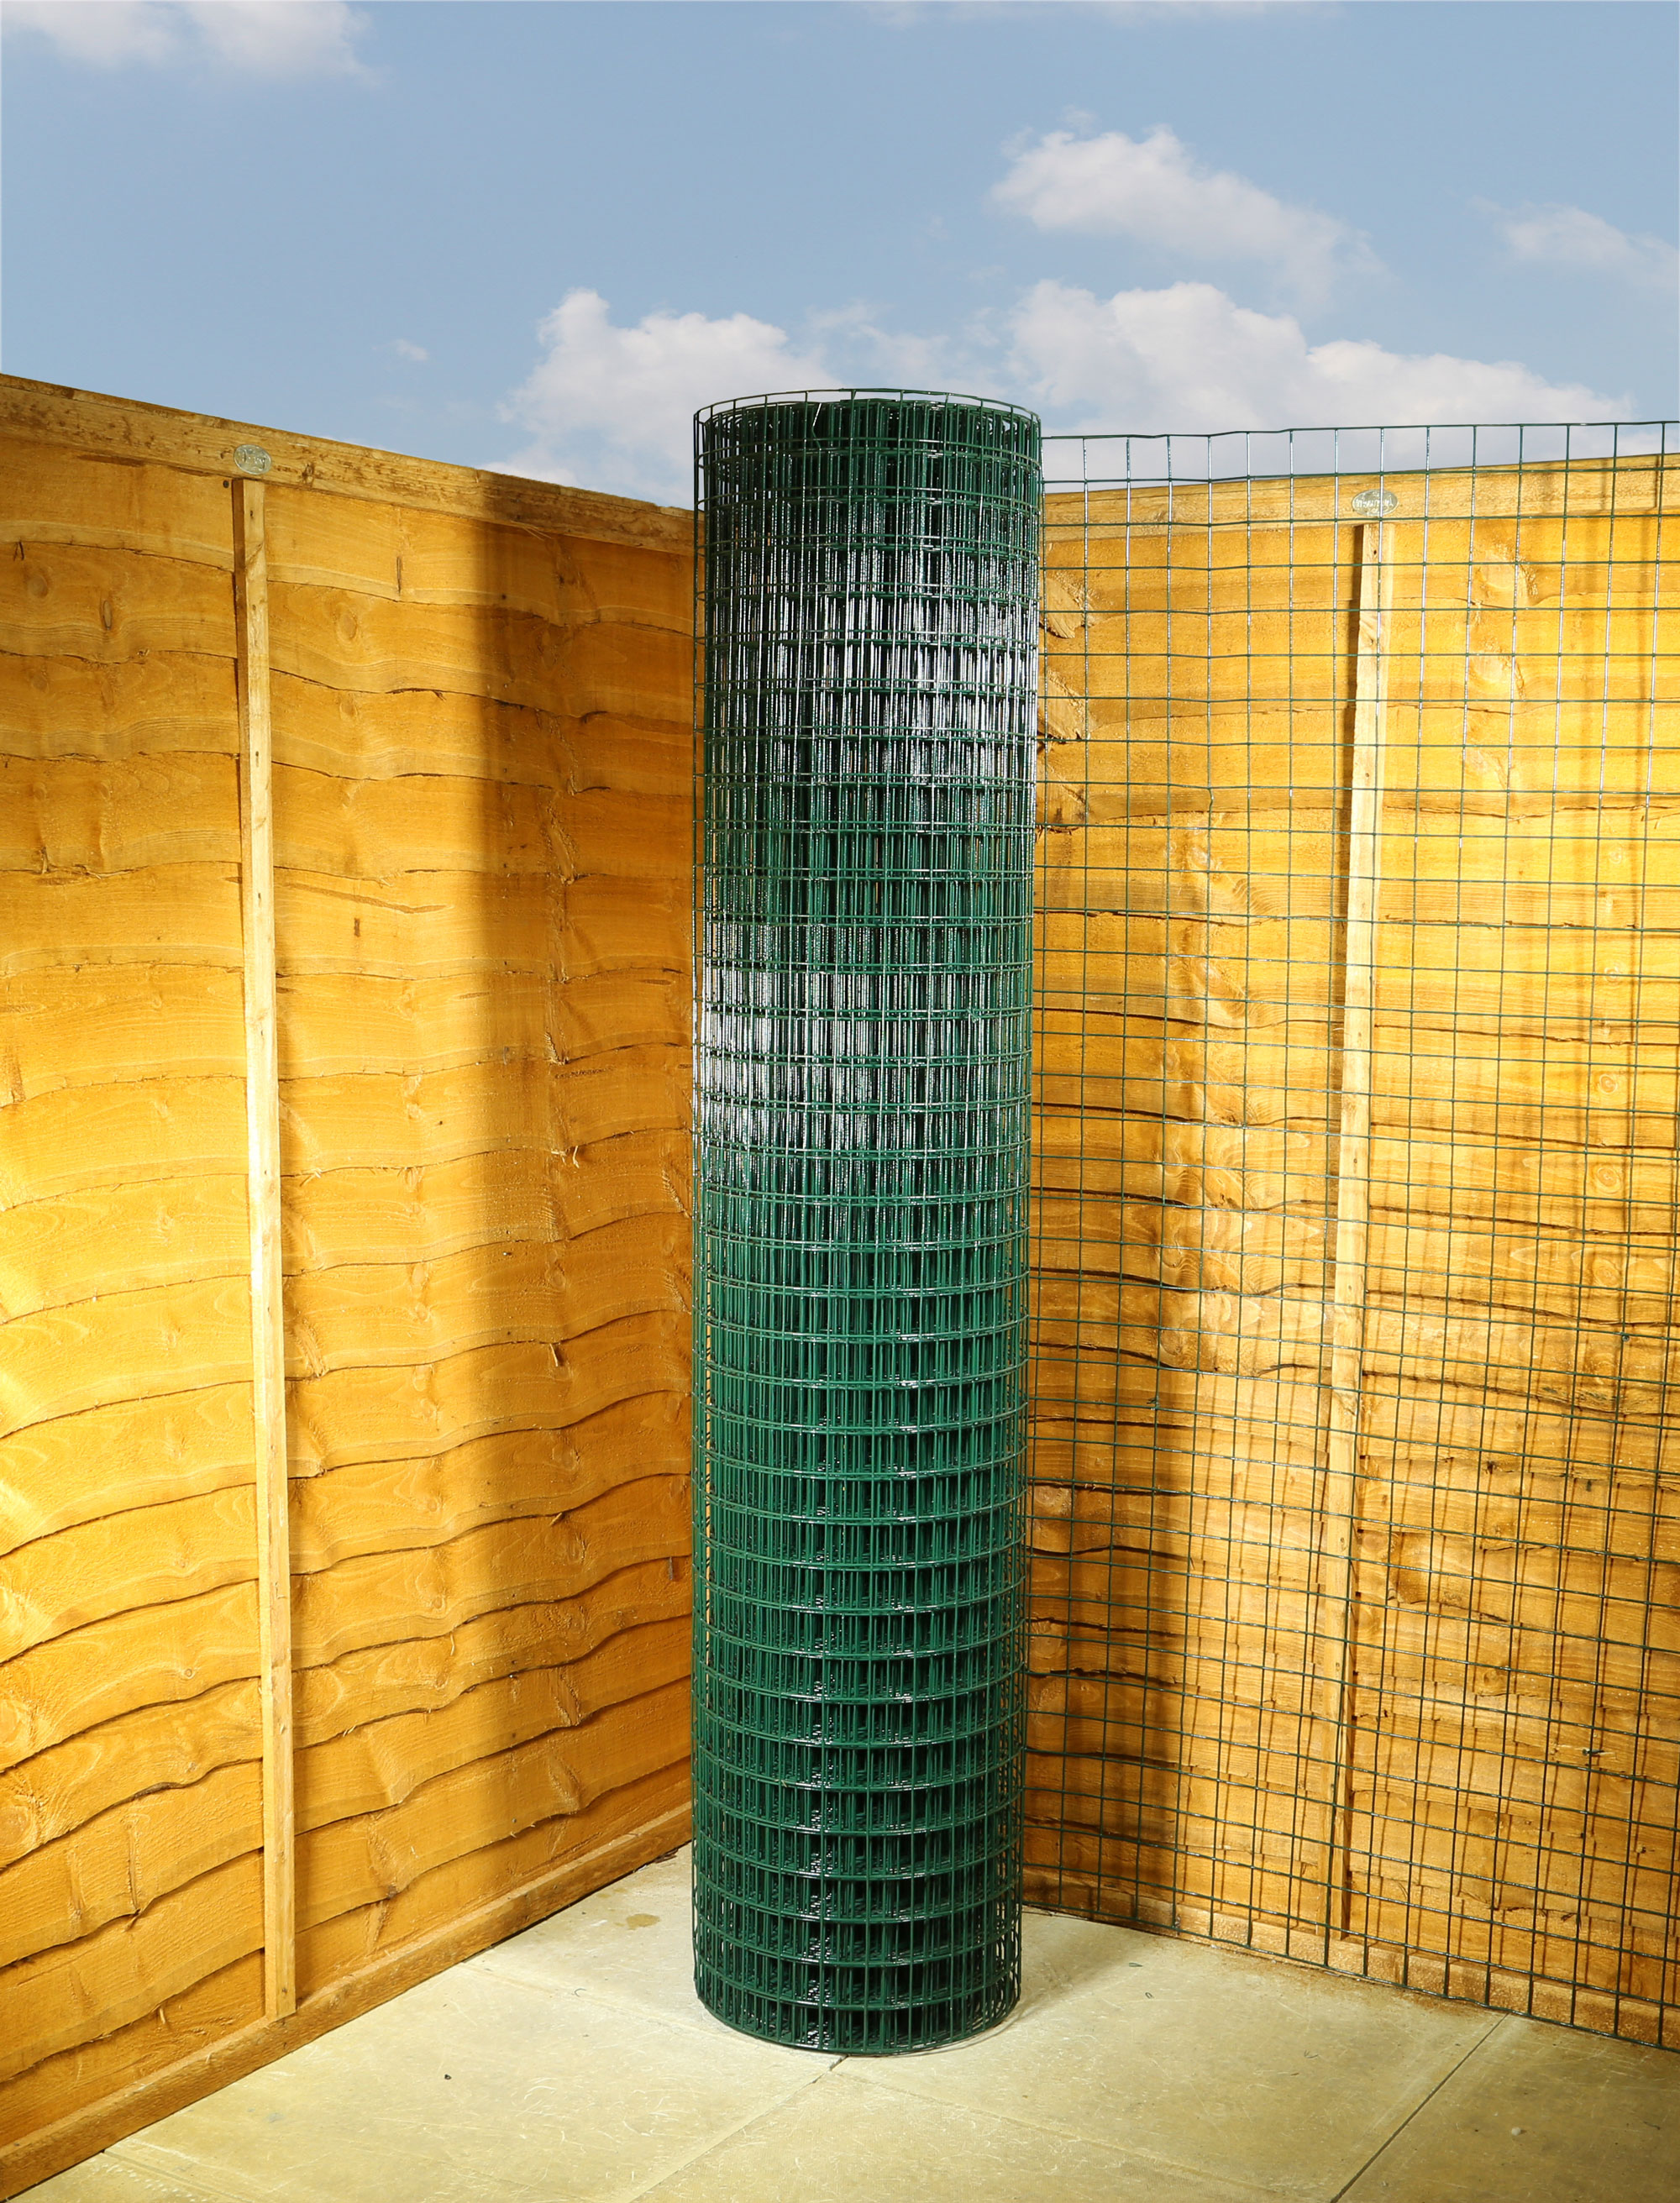 Garden Fencing Green Pvc Wire Mesh 2 X 2 10g 6ft X 25m